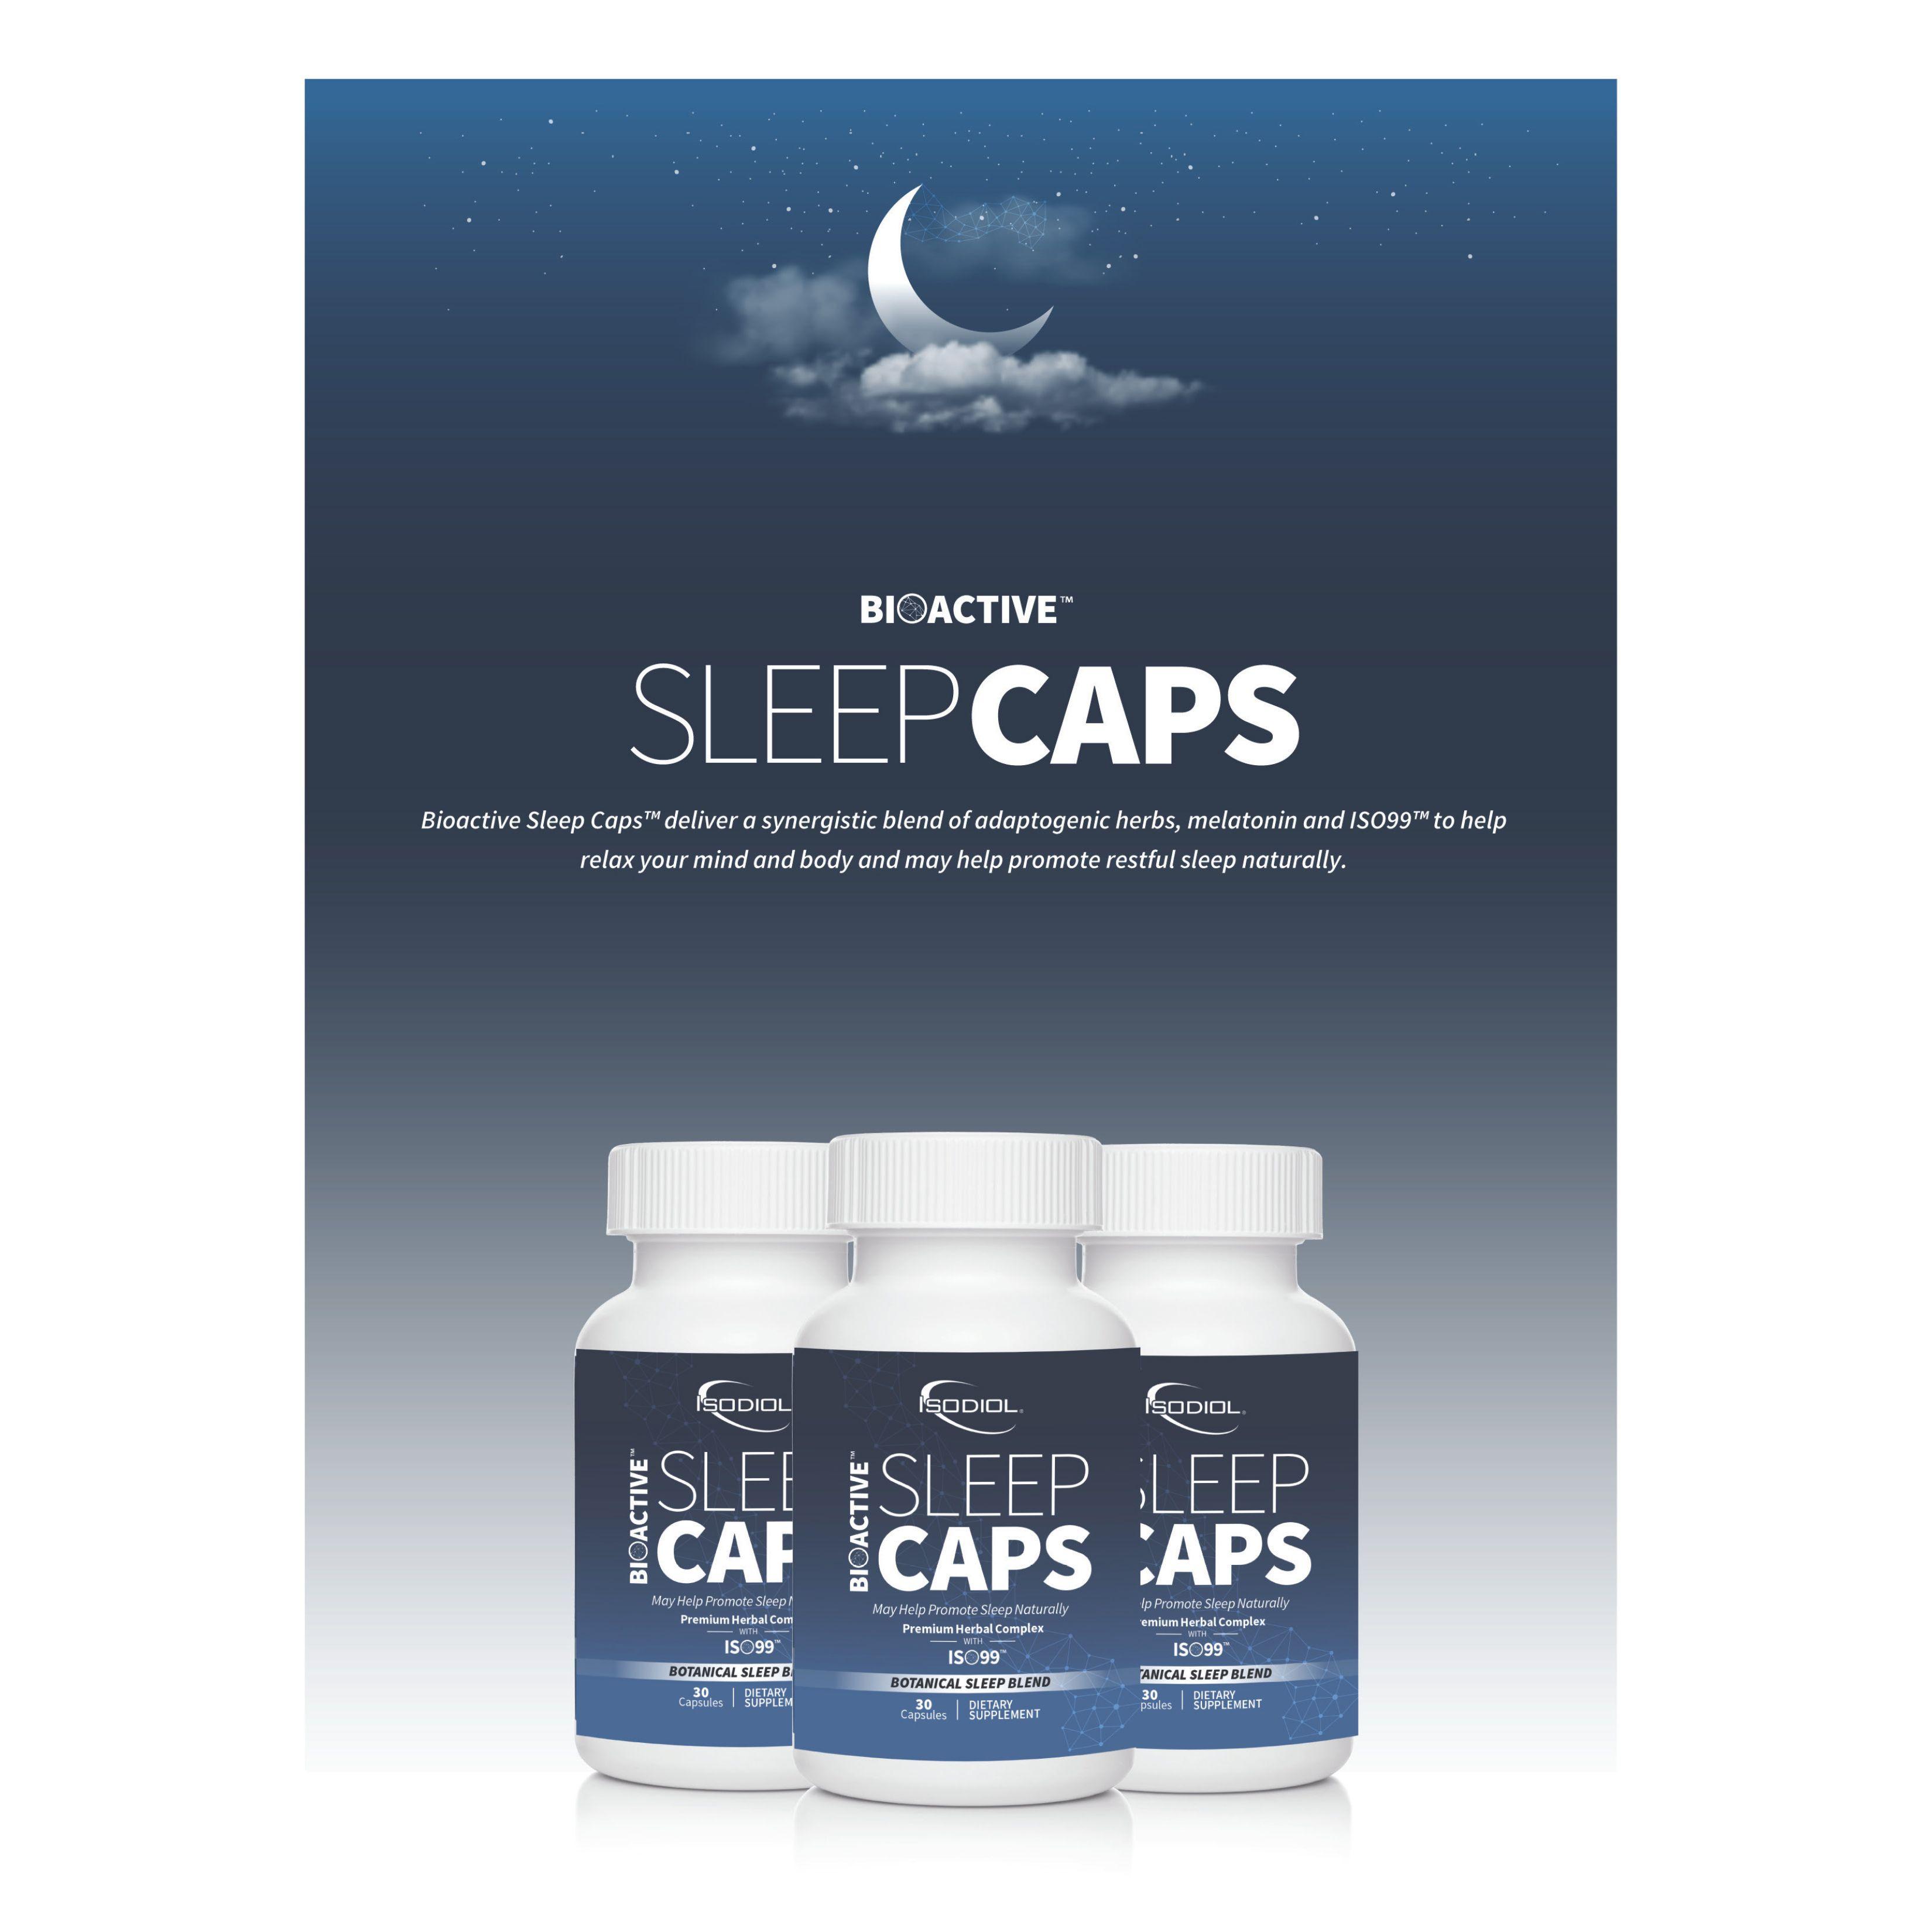 Bioactive Sleep Caps